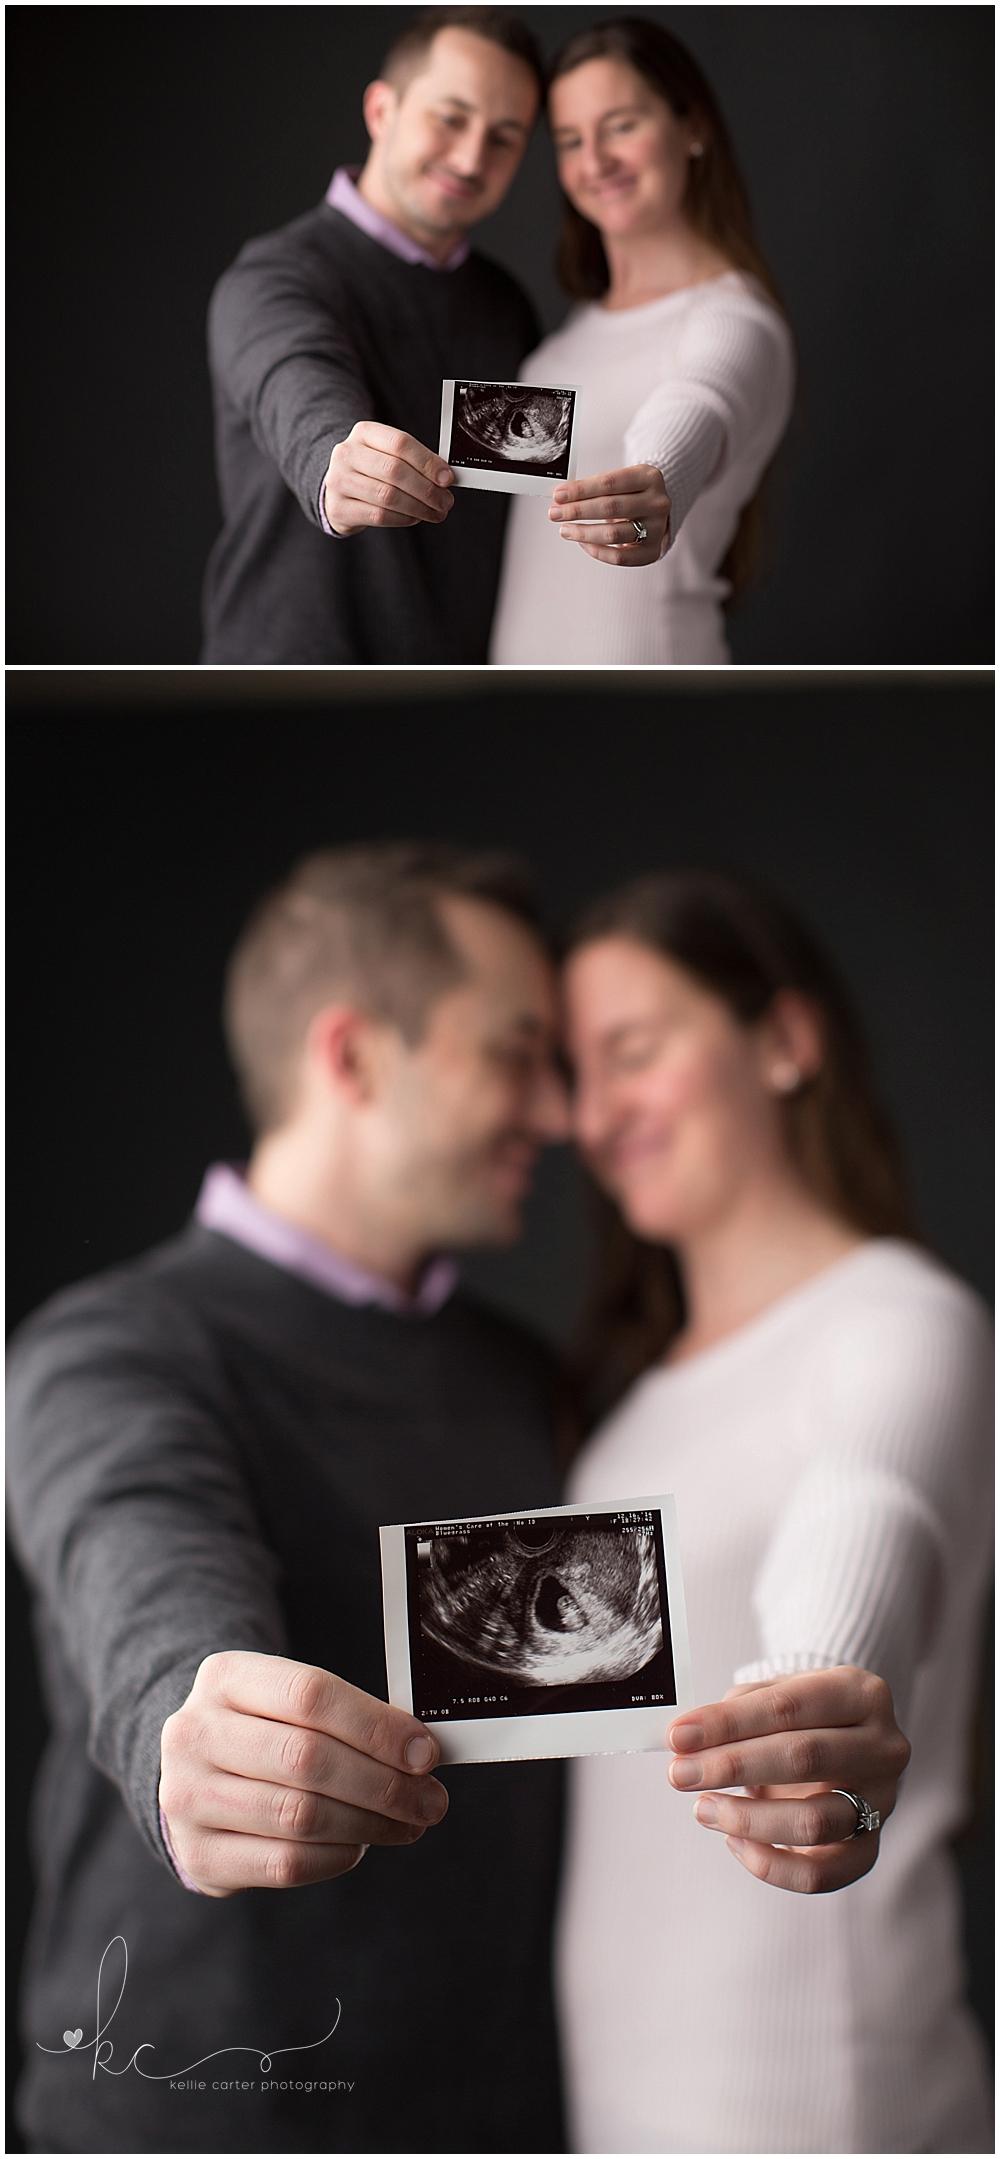 Kellie Carter Kentucky Maternity Photographer